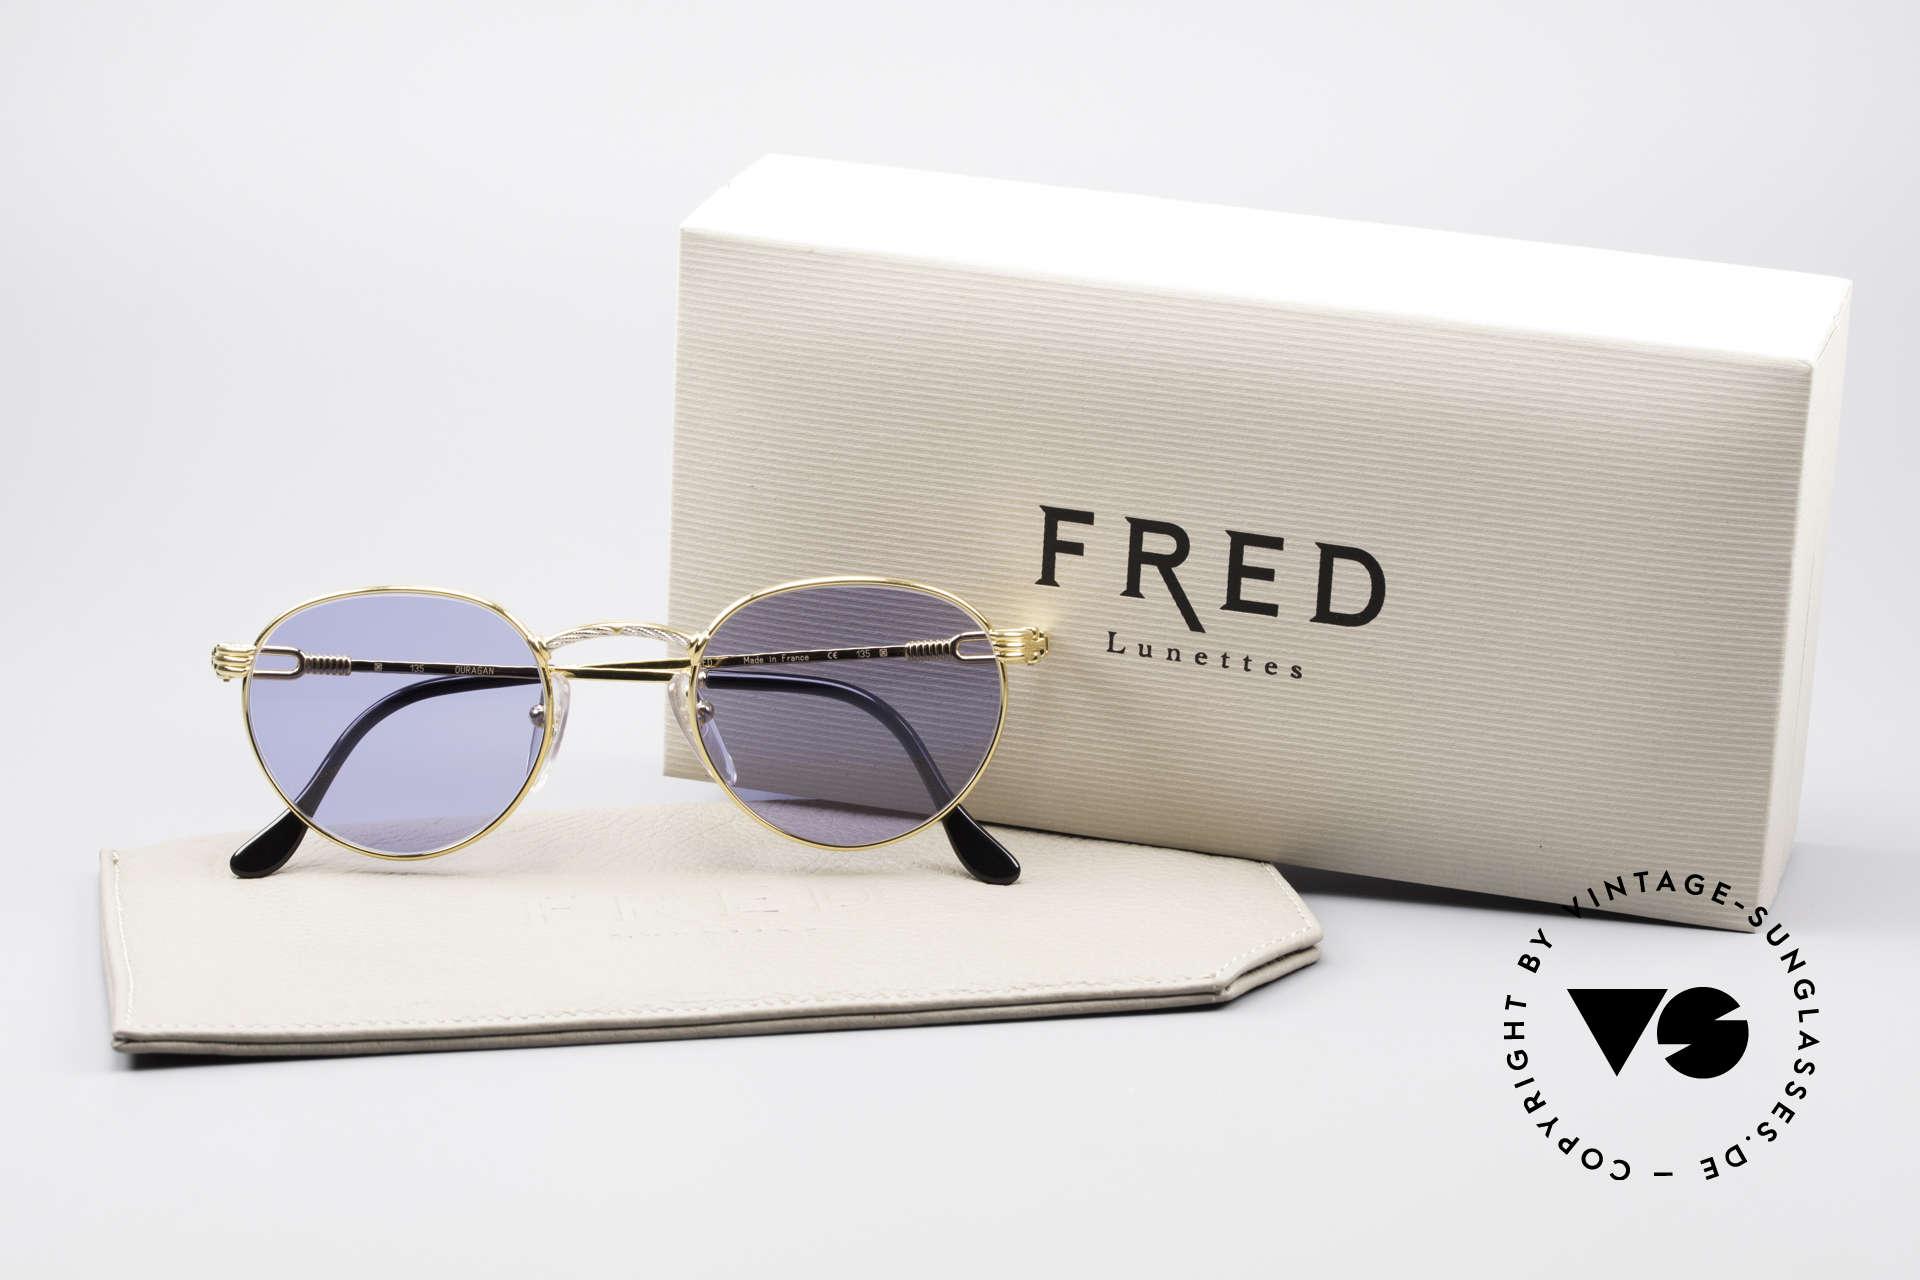 Fred Ouragan Luxury Panto Sunglasses, unworn vintage ORIGINAL & NO RETRO SUNGLASSES, Made for Men